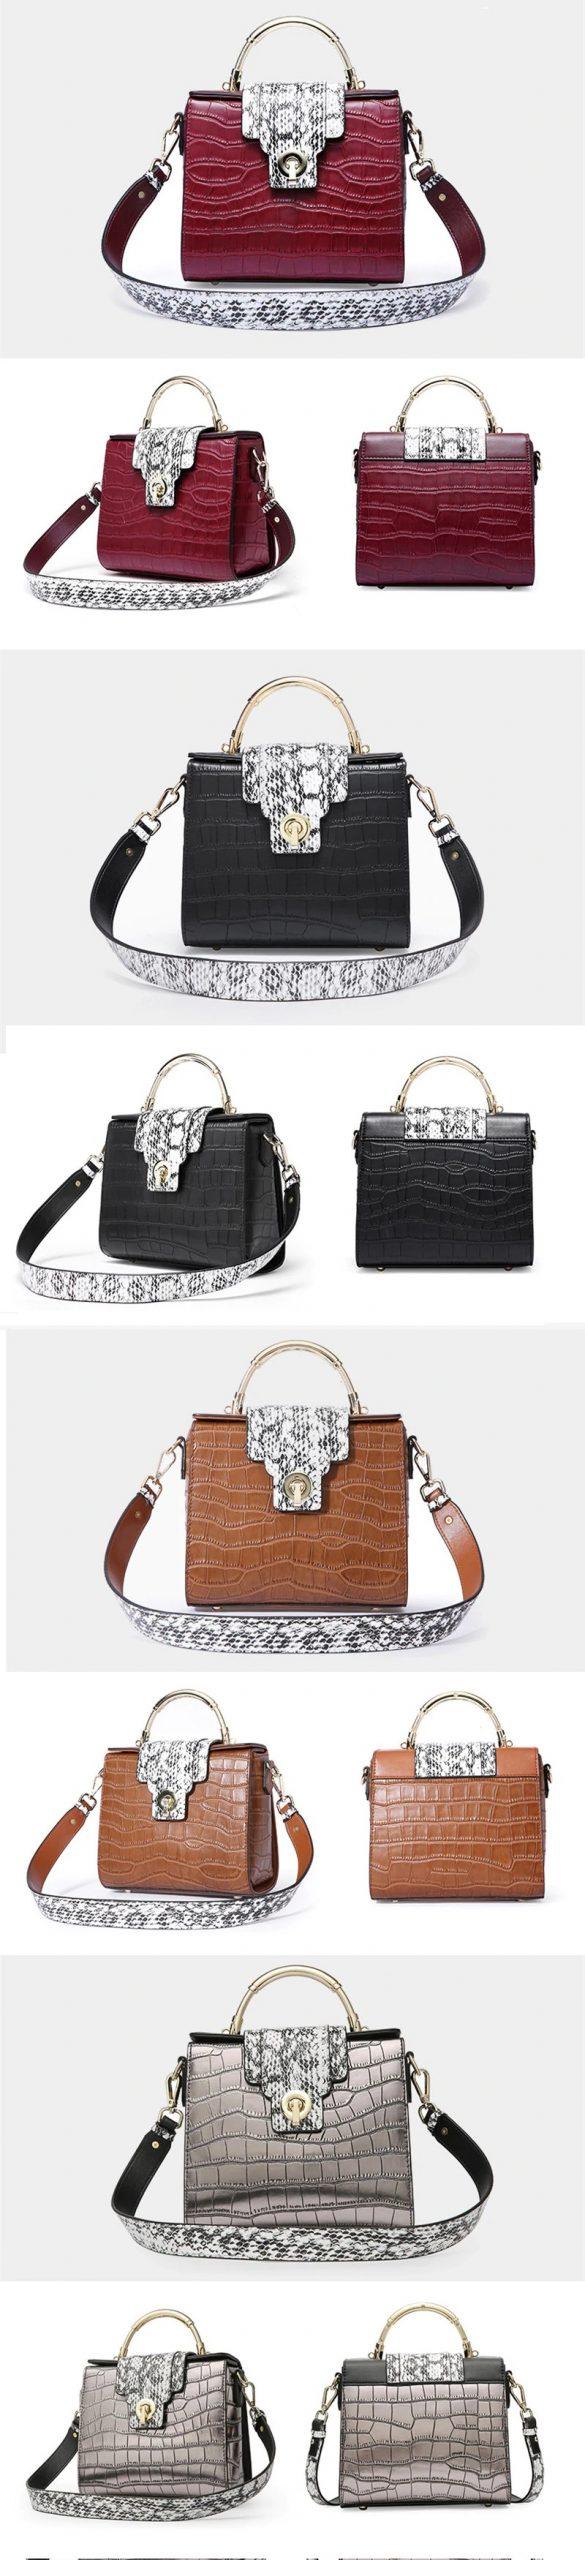 Genuine Leather Bag Ladies Crossbody Messenger Bag Crocodile3 1 scaled